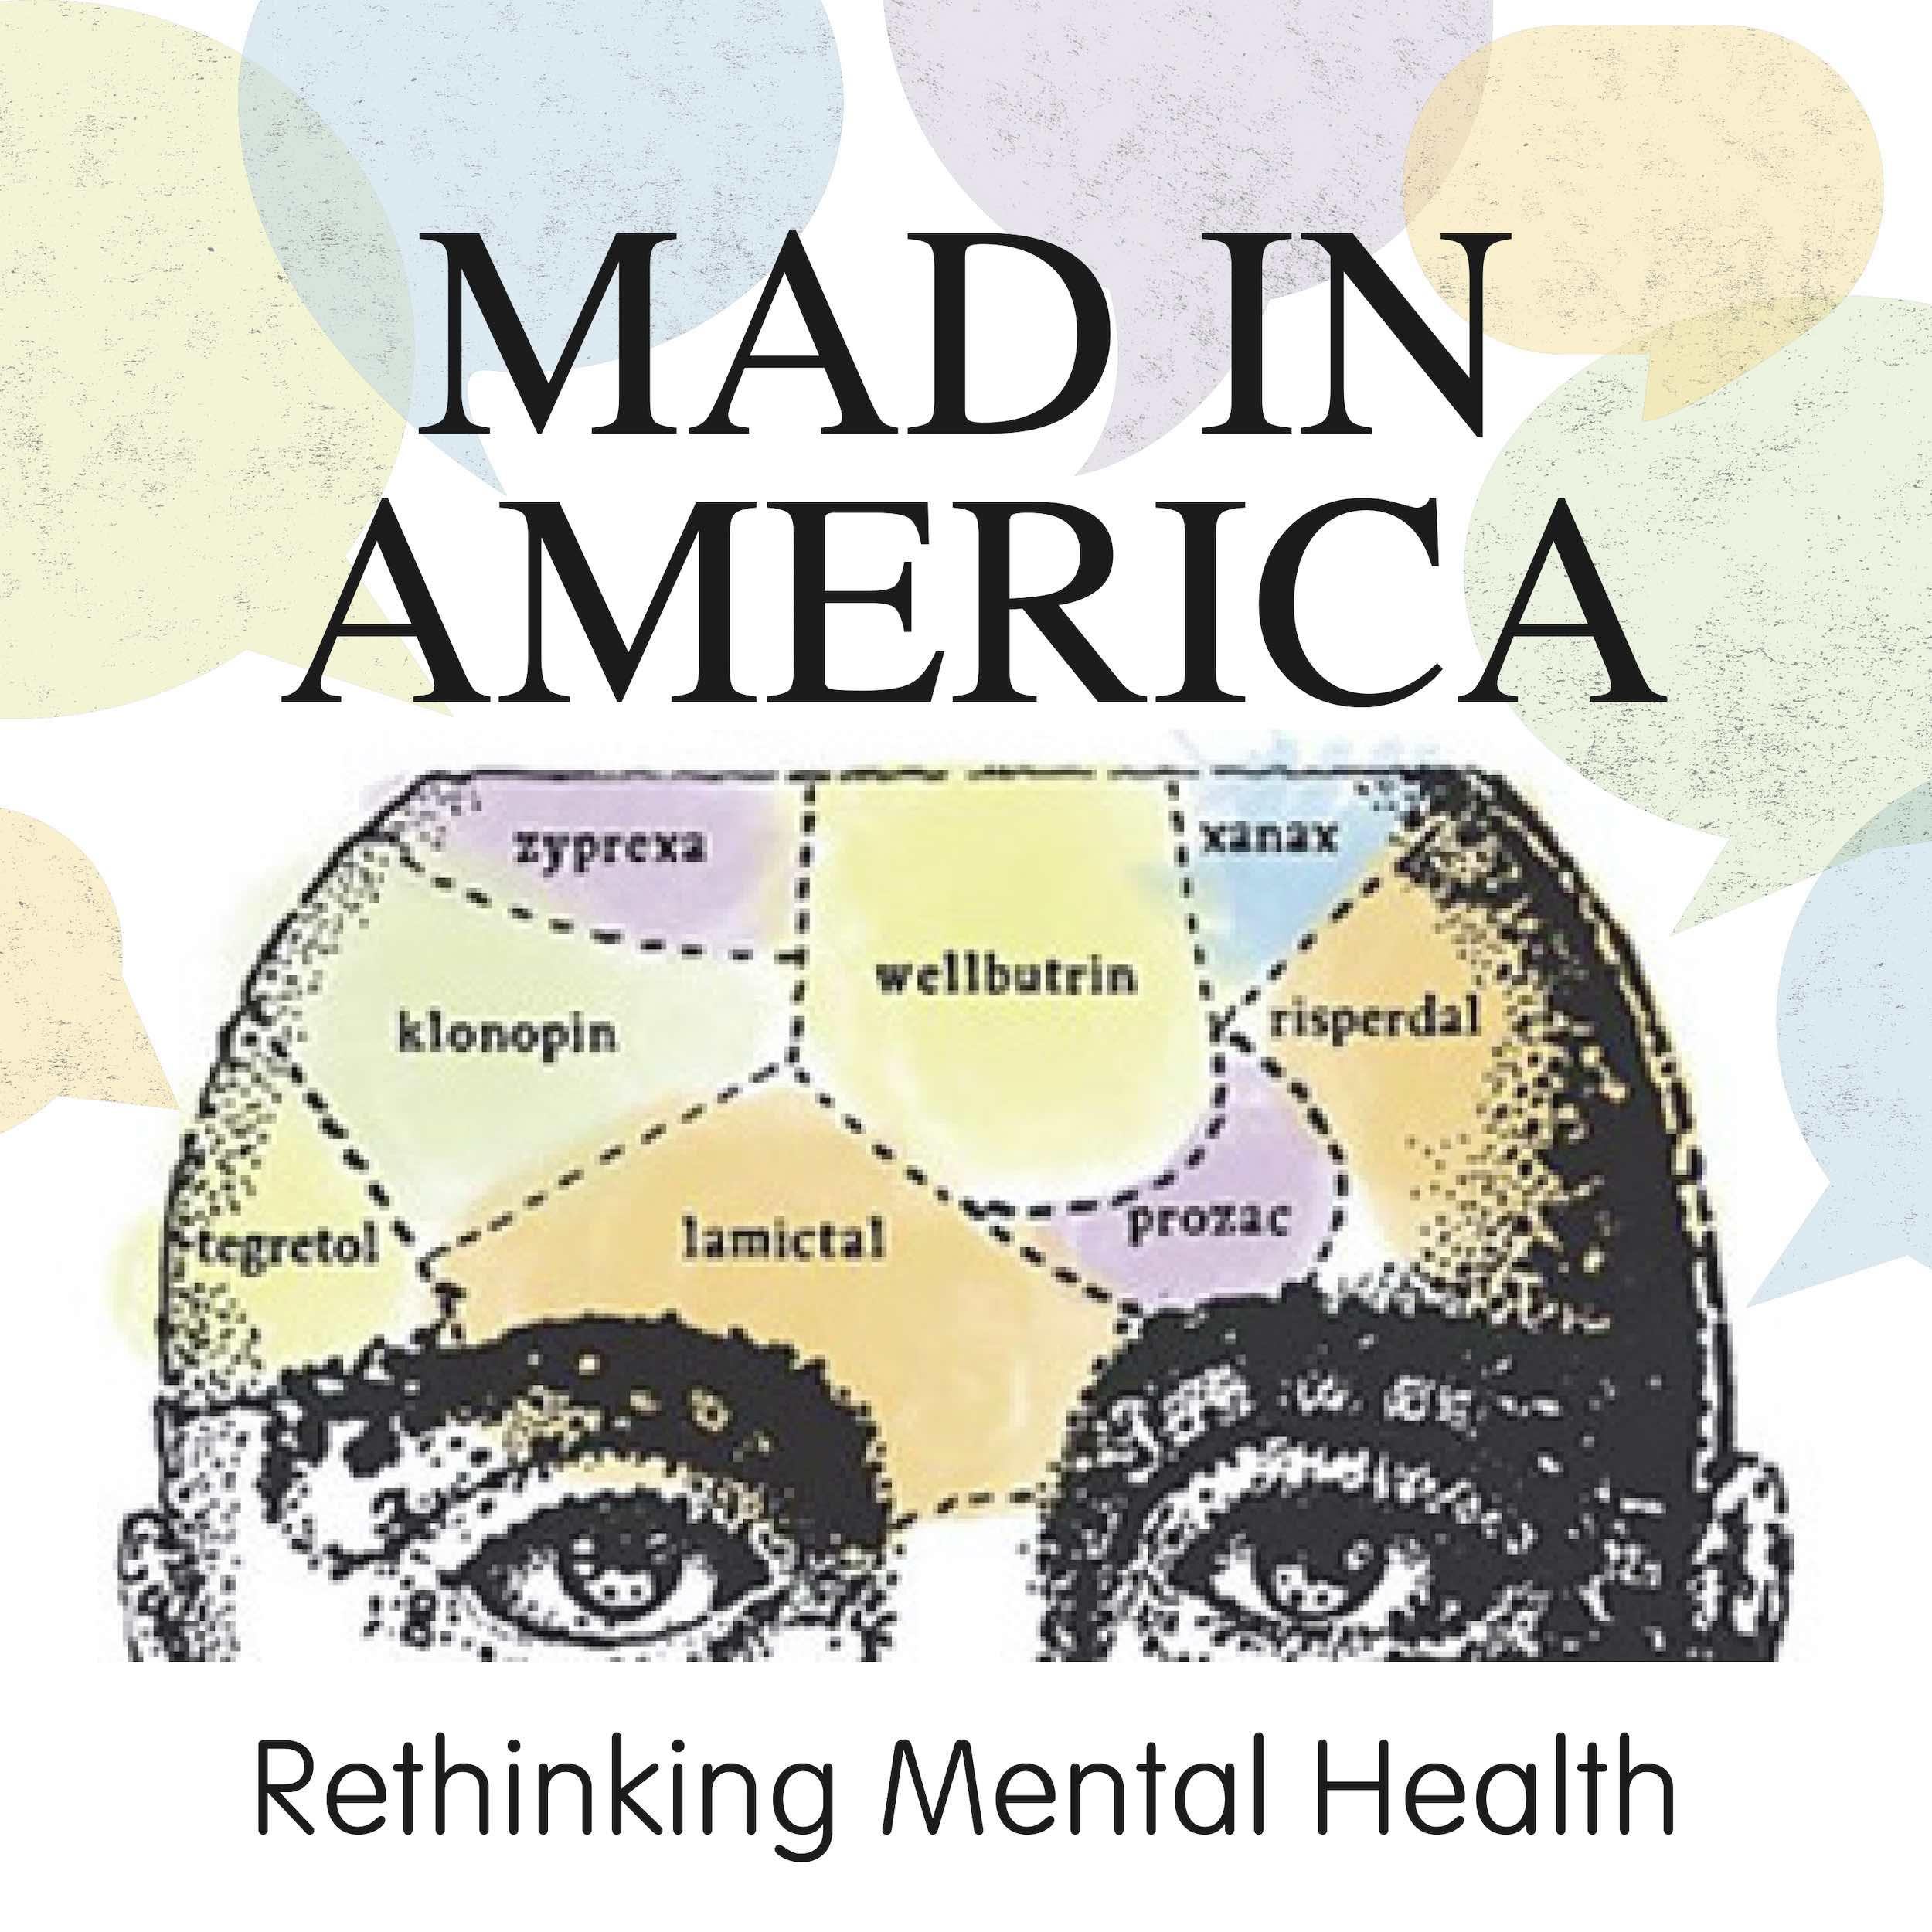 Mad in America: Rethinking Mental Health - Mab Segrest - Narrating Asylum History Through an Anti-Racist Lens